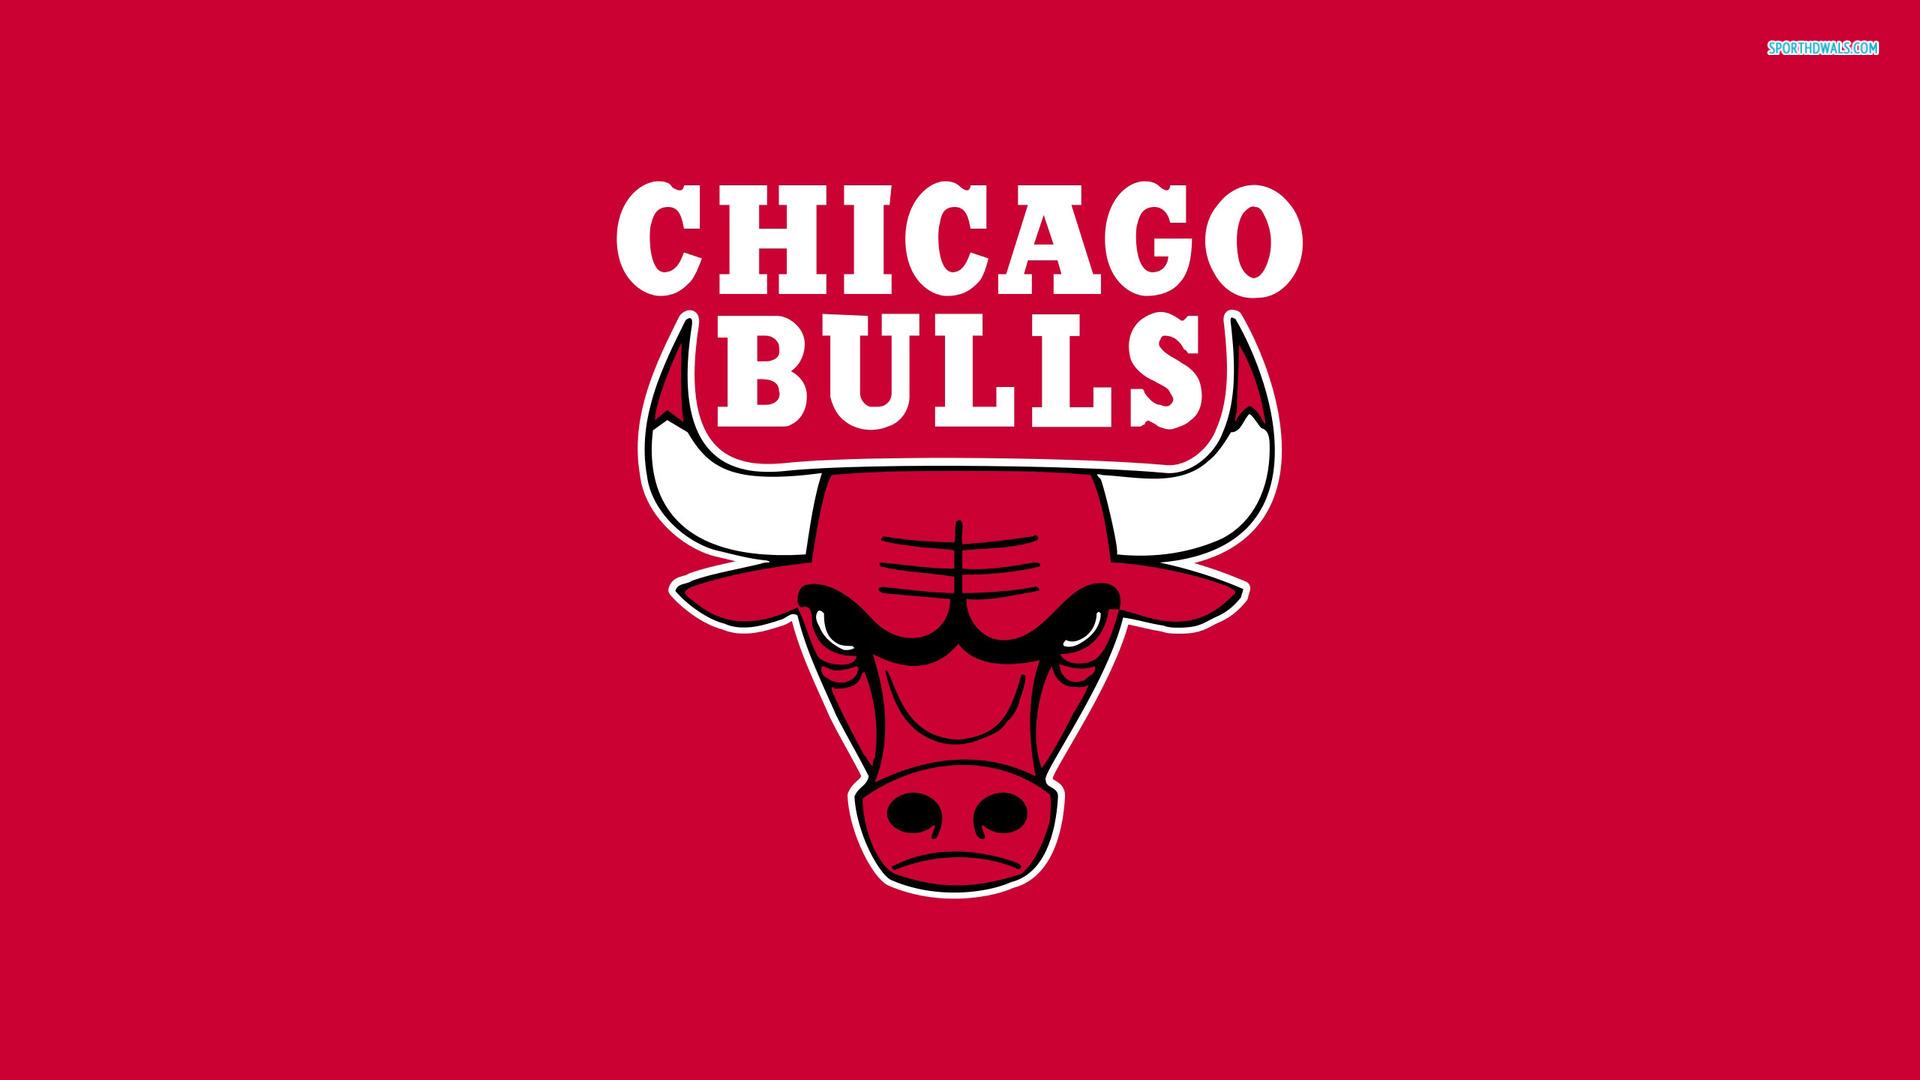 chicago bulls wallpapers HD 1920x1080